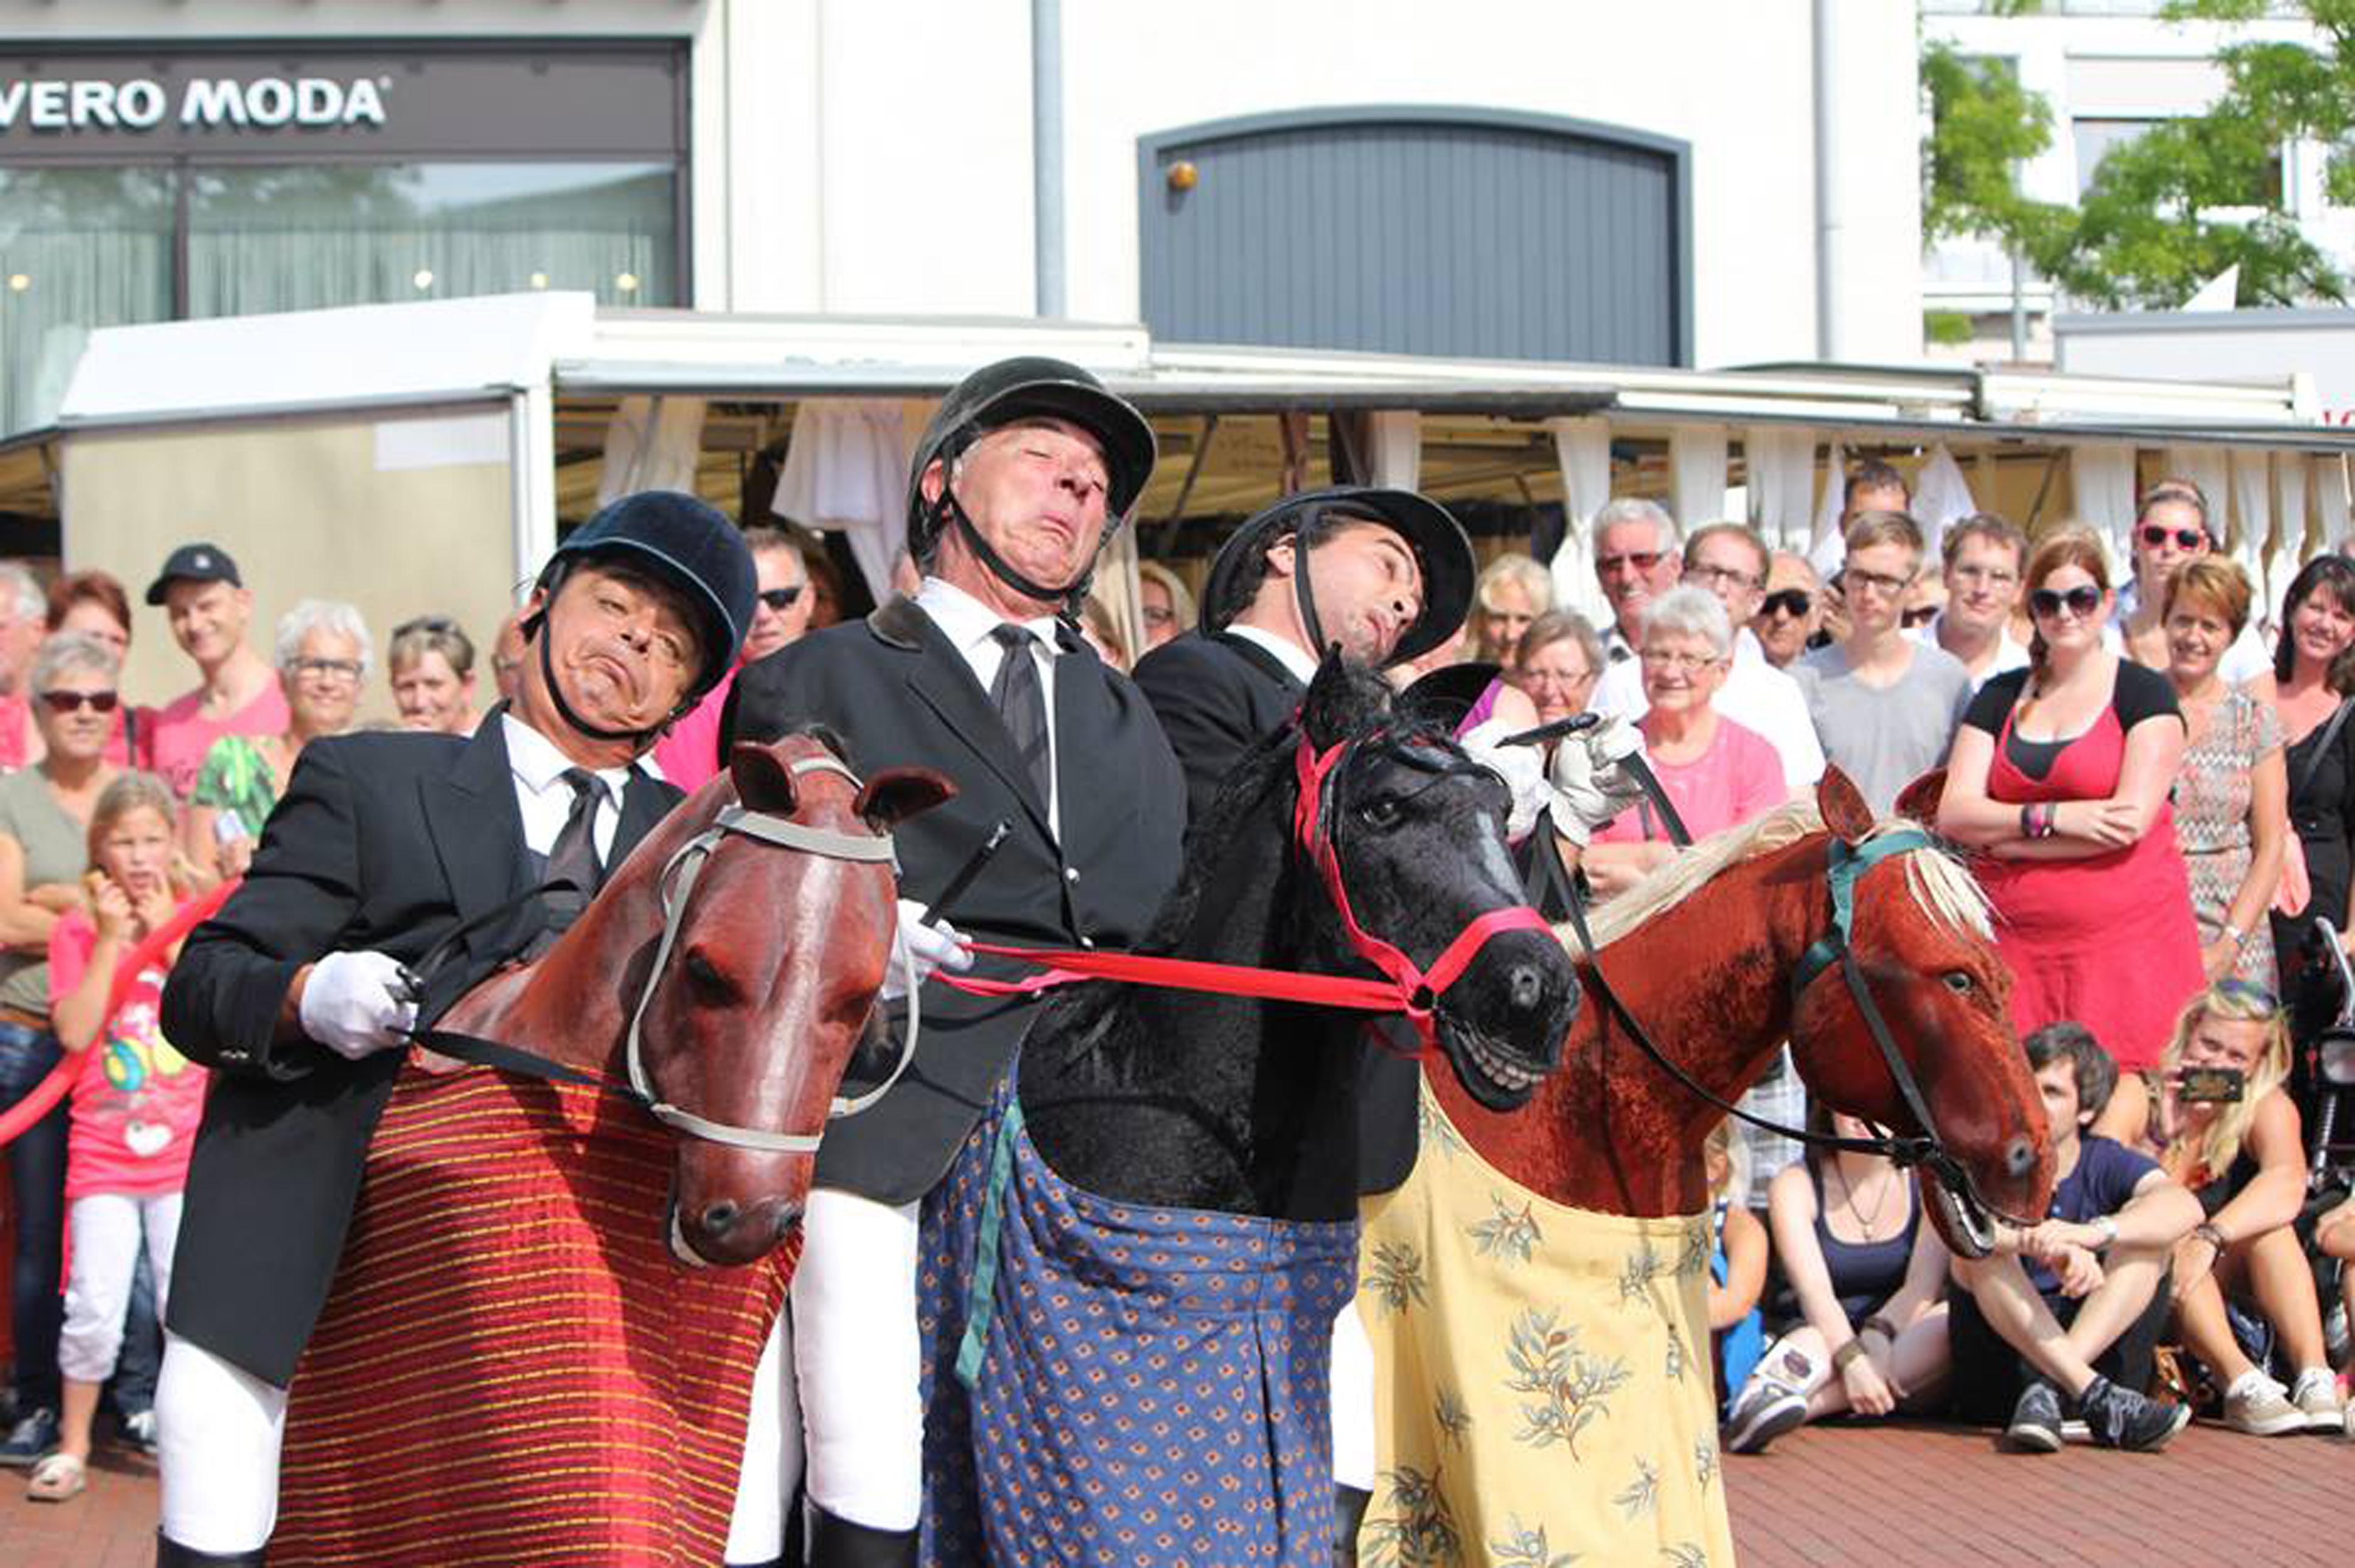 Spectacle The Horsemen